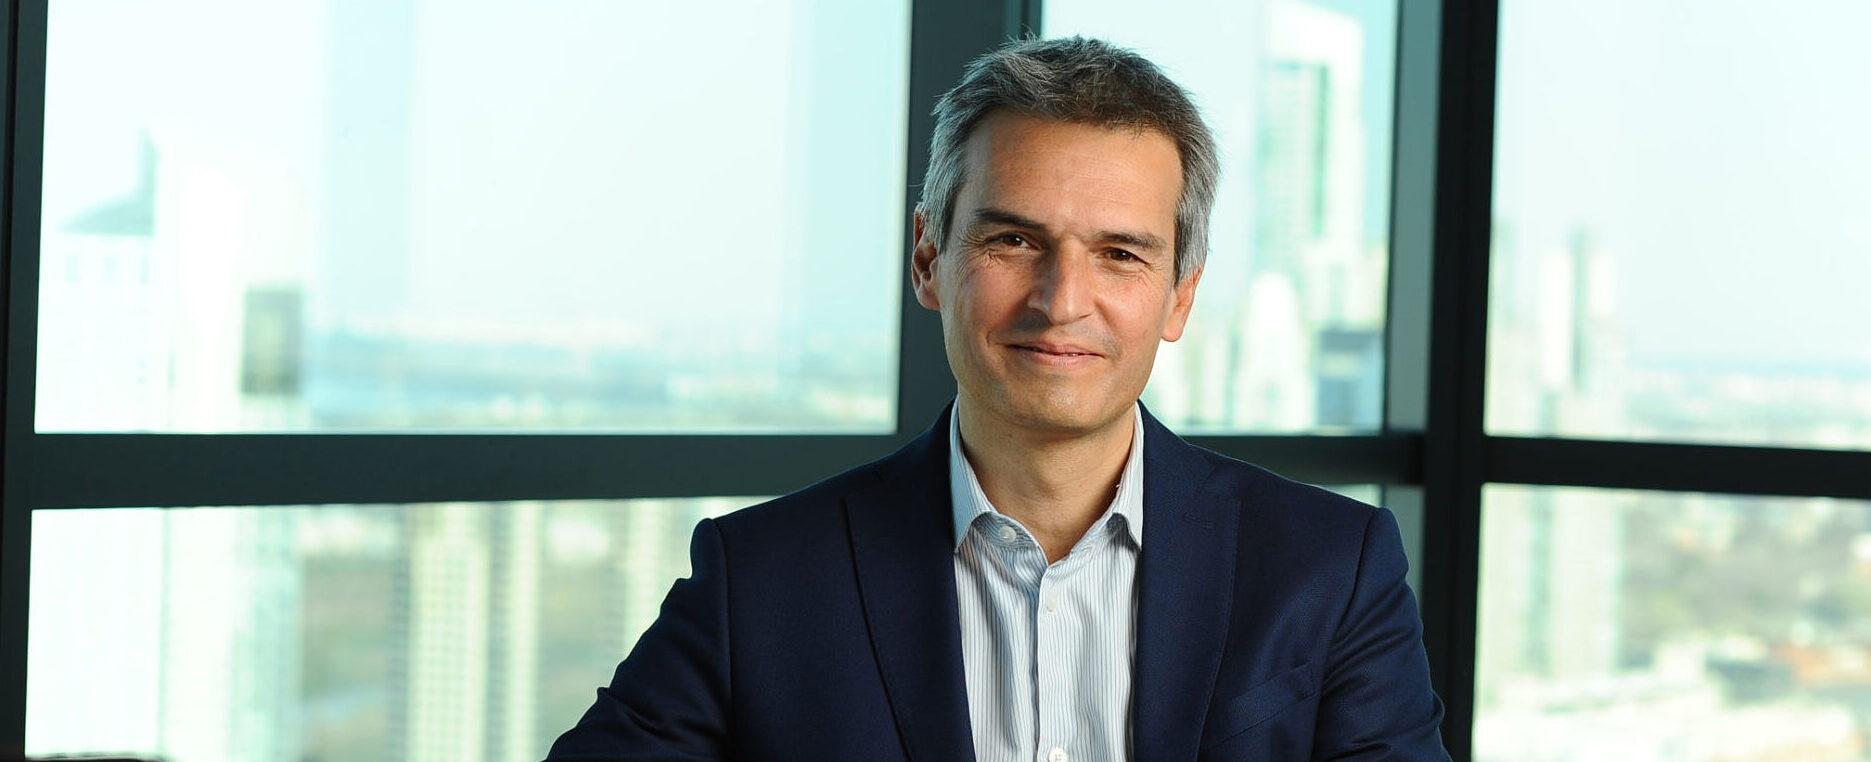 Leandro-Alvarez-Director-Ingeniería-Data-BBVA-Argentina